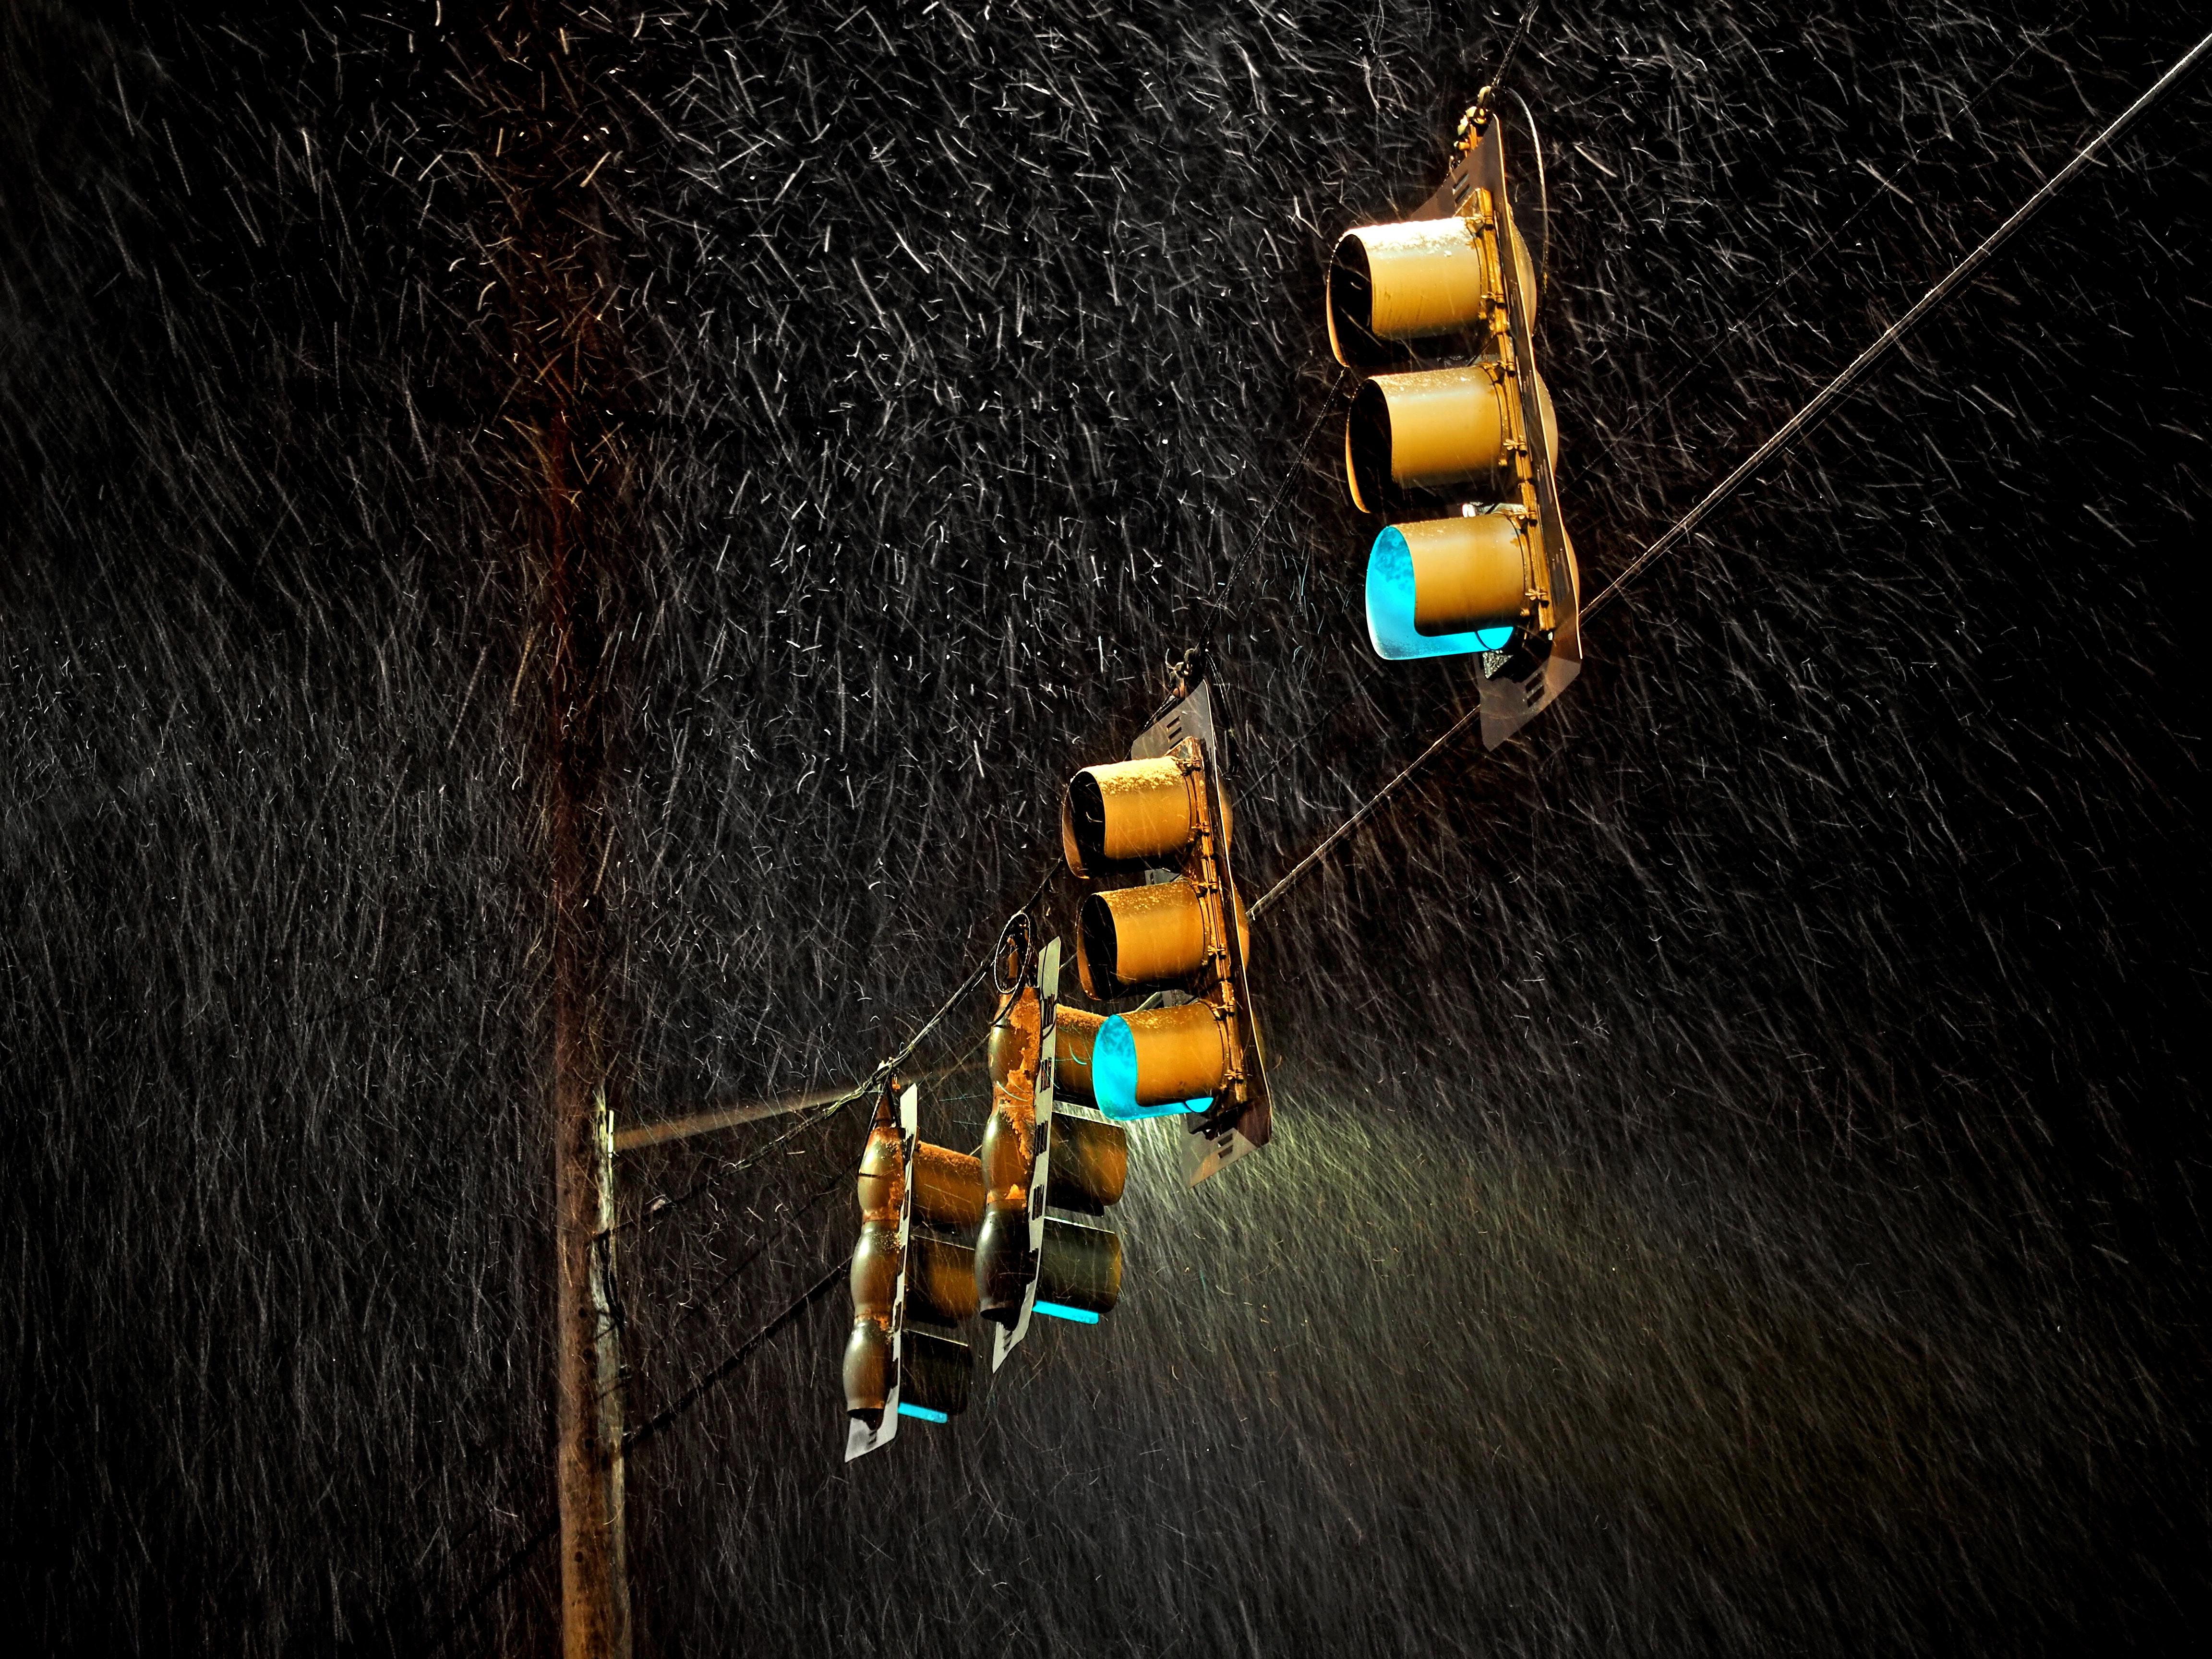 Traffic Lights Night Rain 5k, HD Photography, 4k